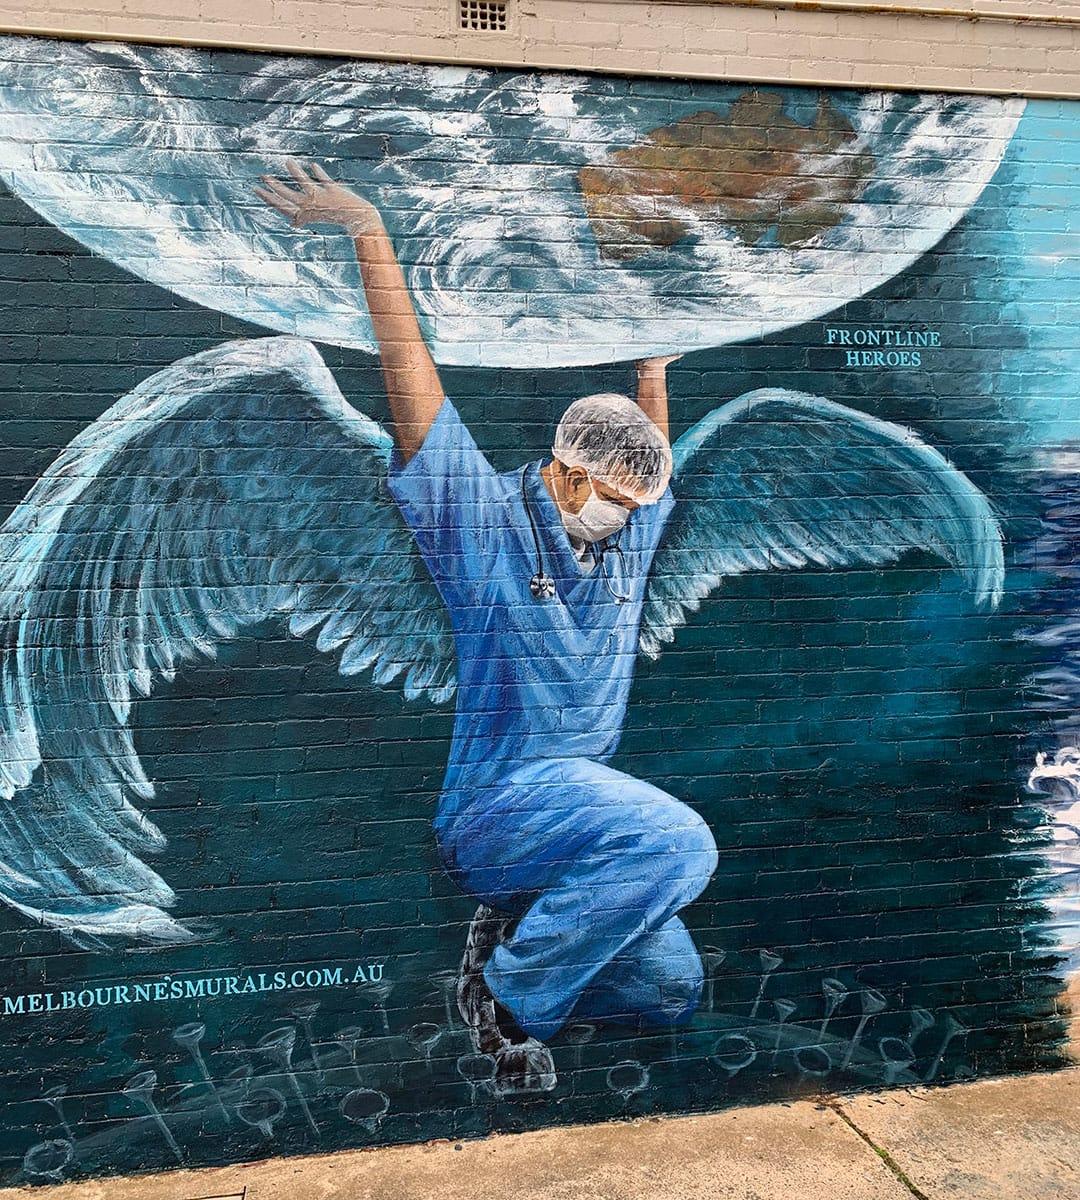 street art of nurse holding up world, Melbournes murals - Black Rock